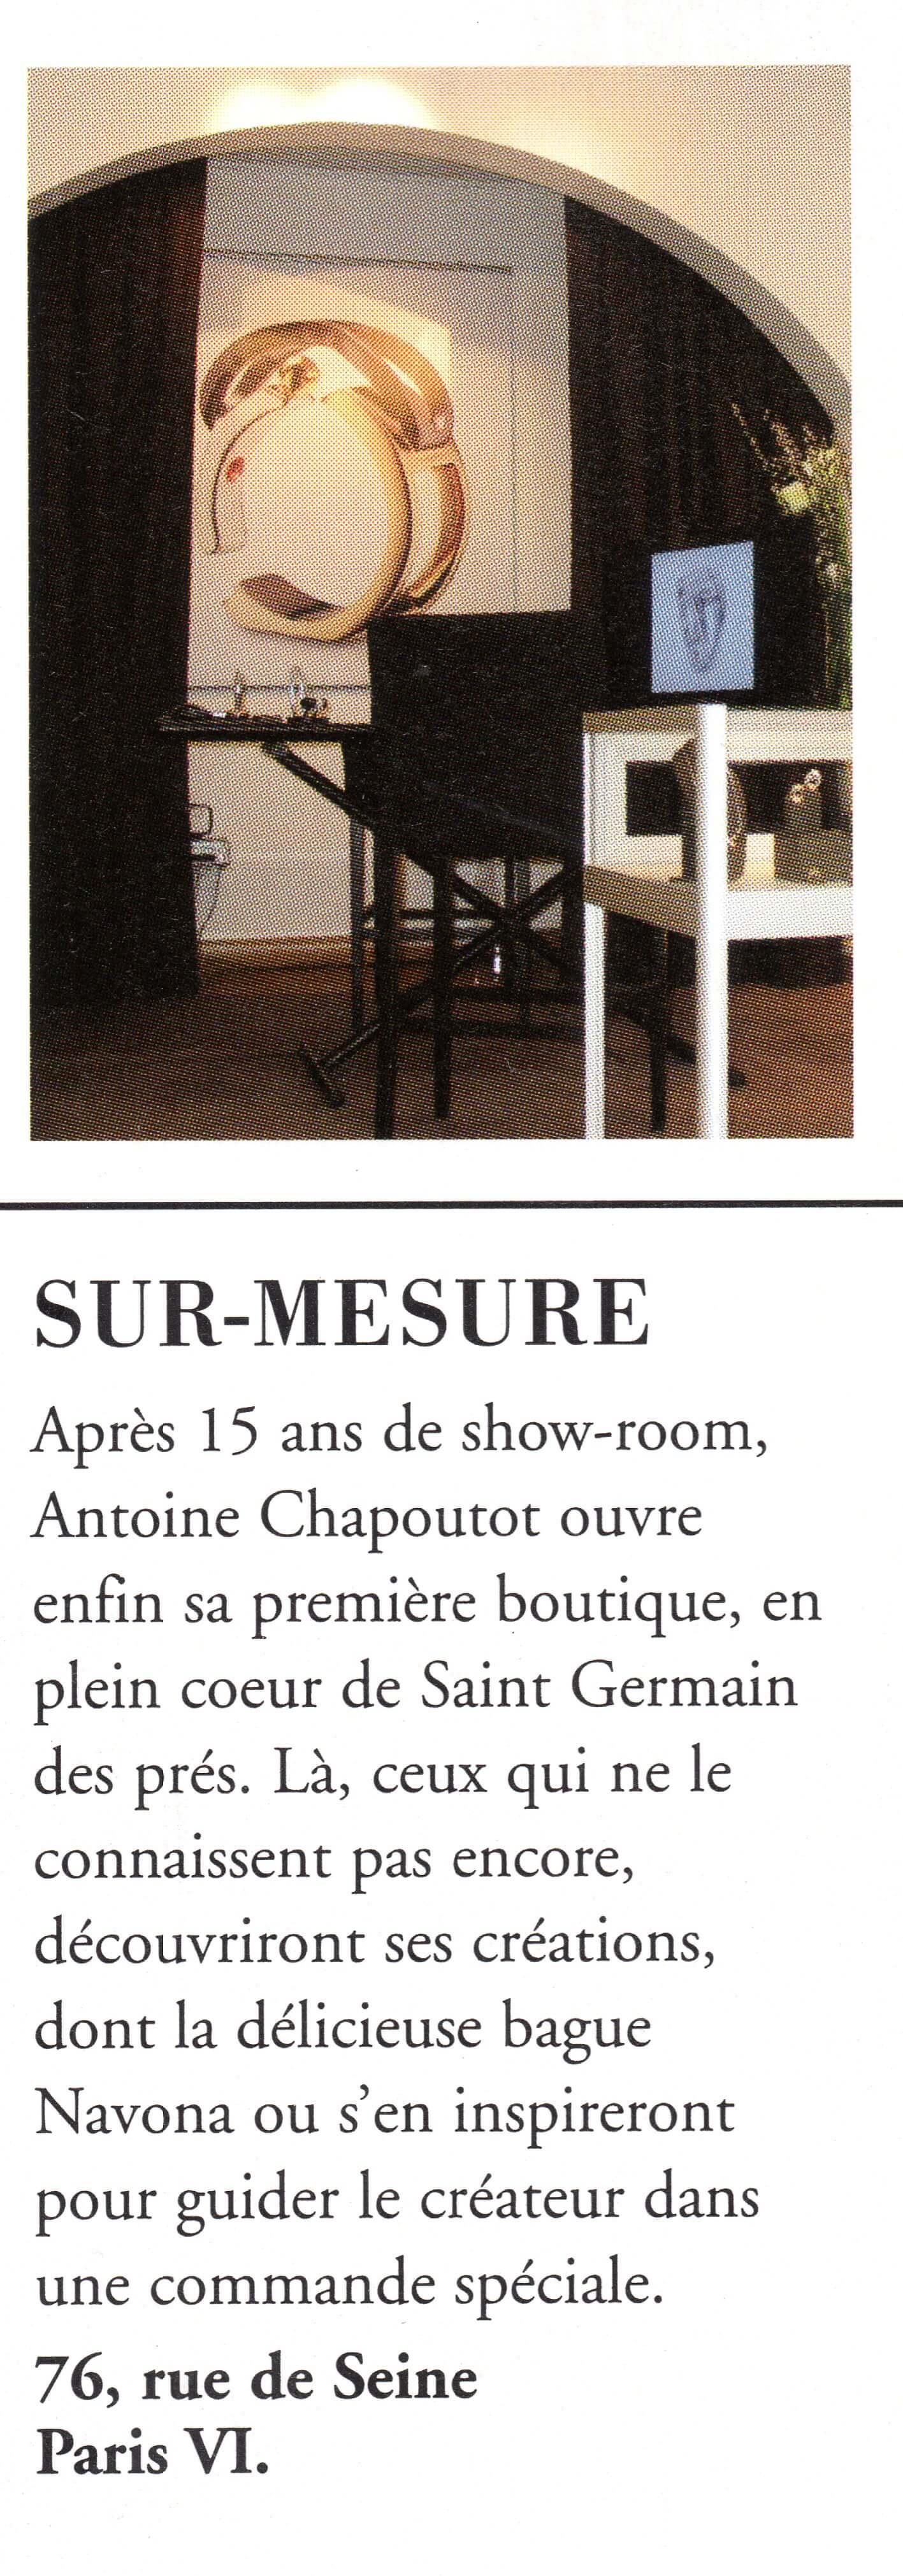 2010 Figaro Madame - Décembre 2010 - Article.jpg